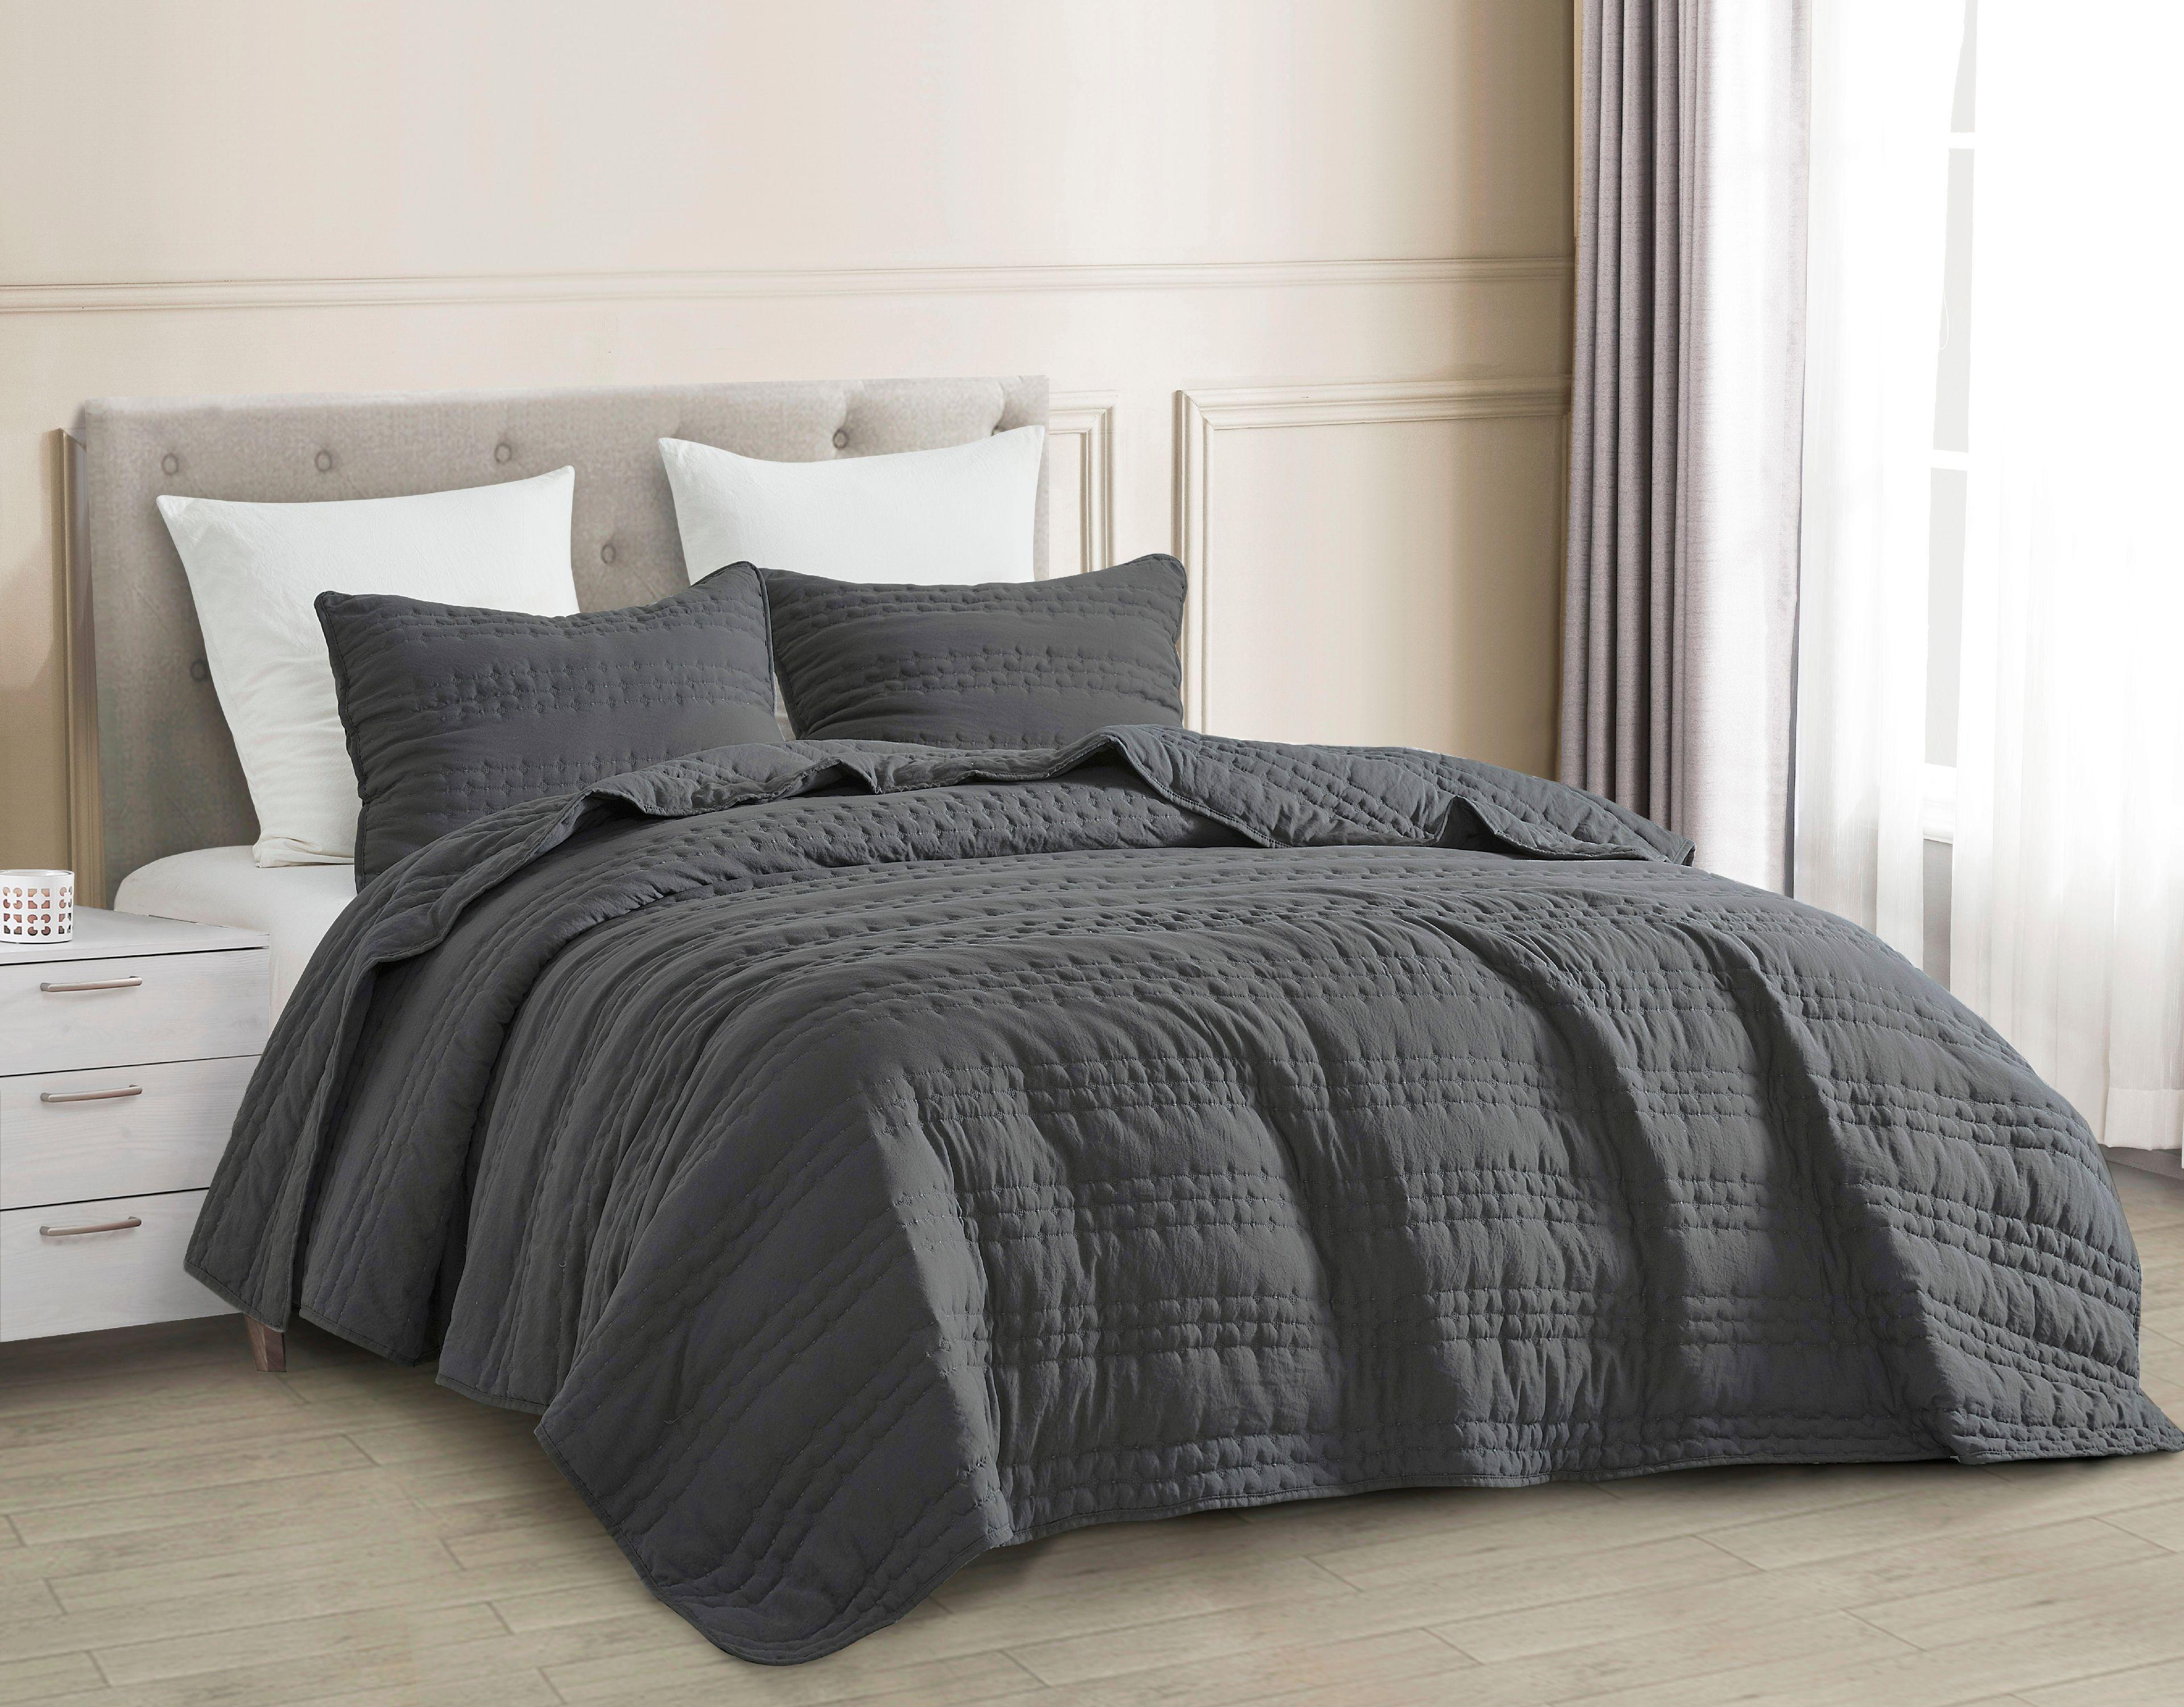 13+ Dark gray bedding set ideas